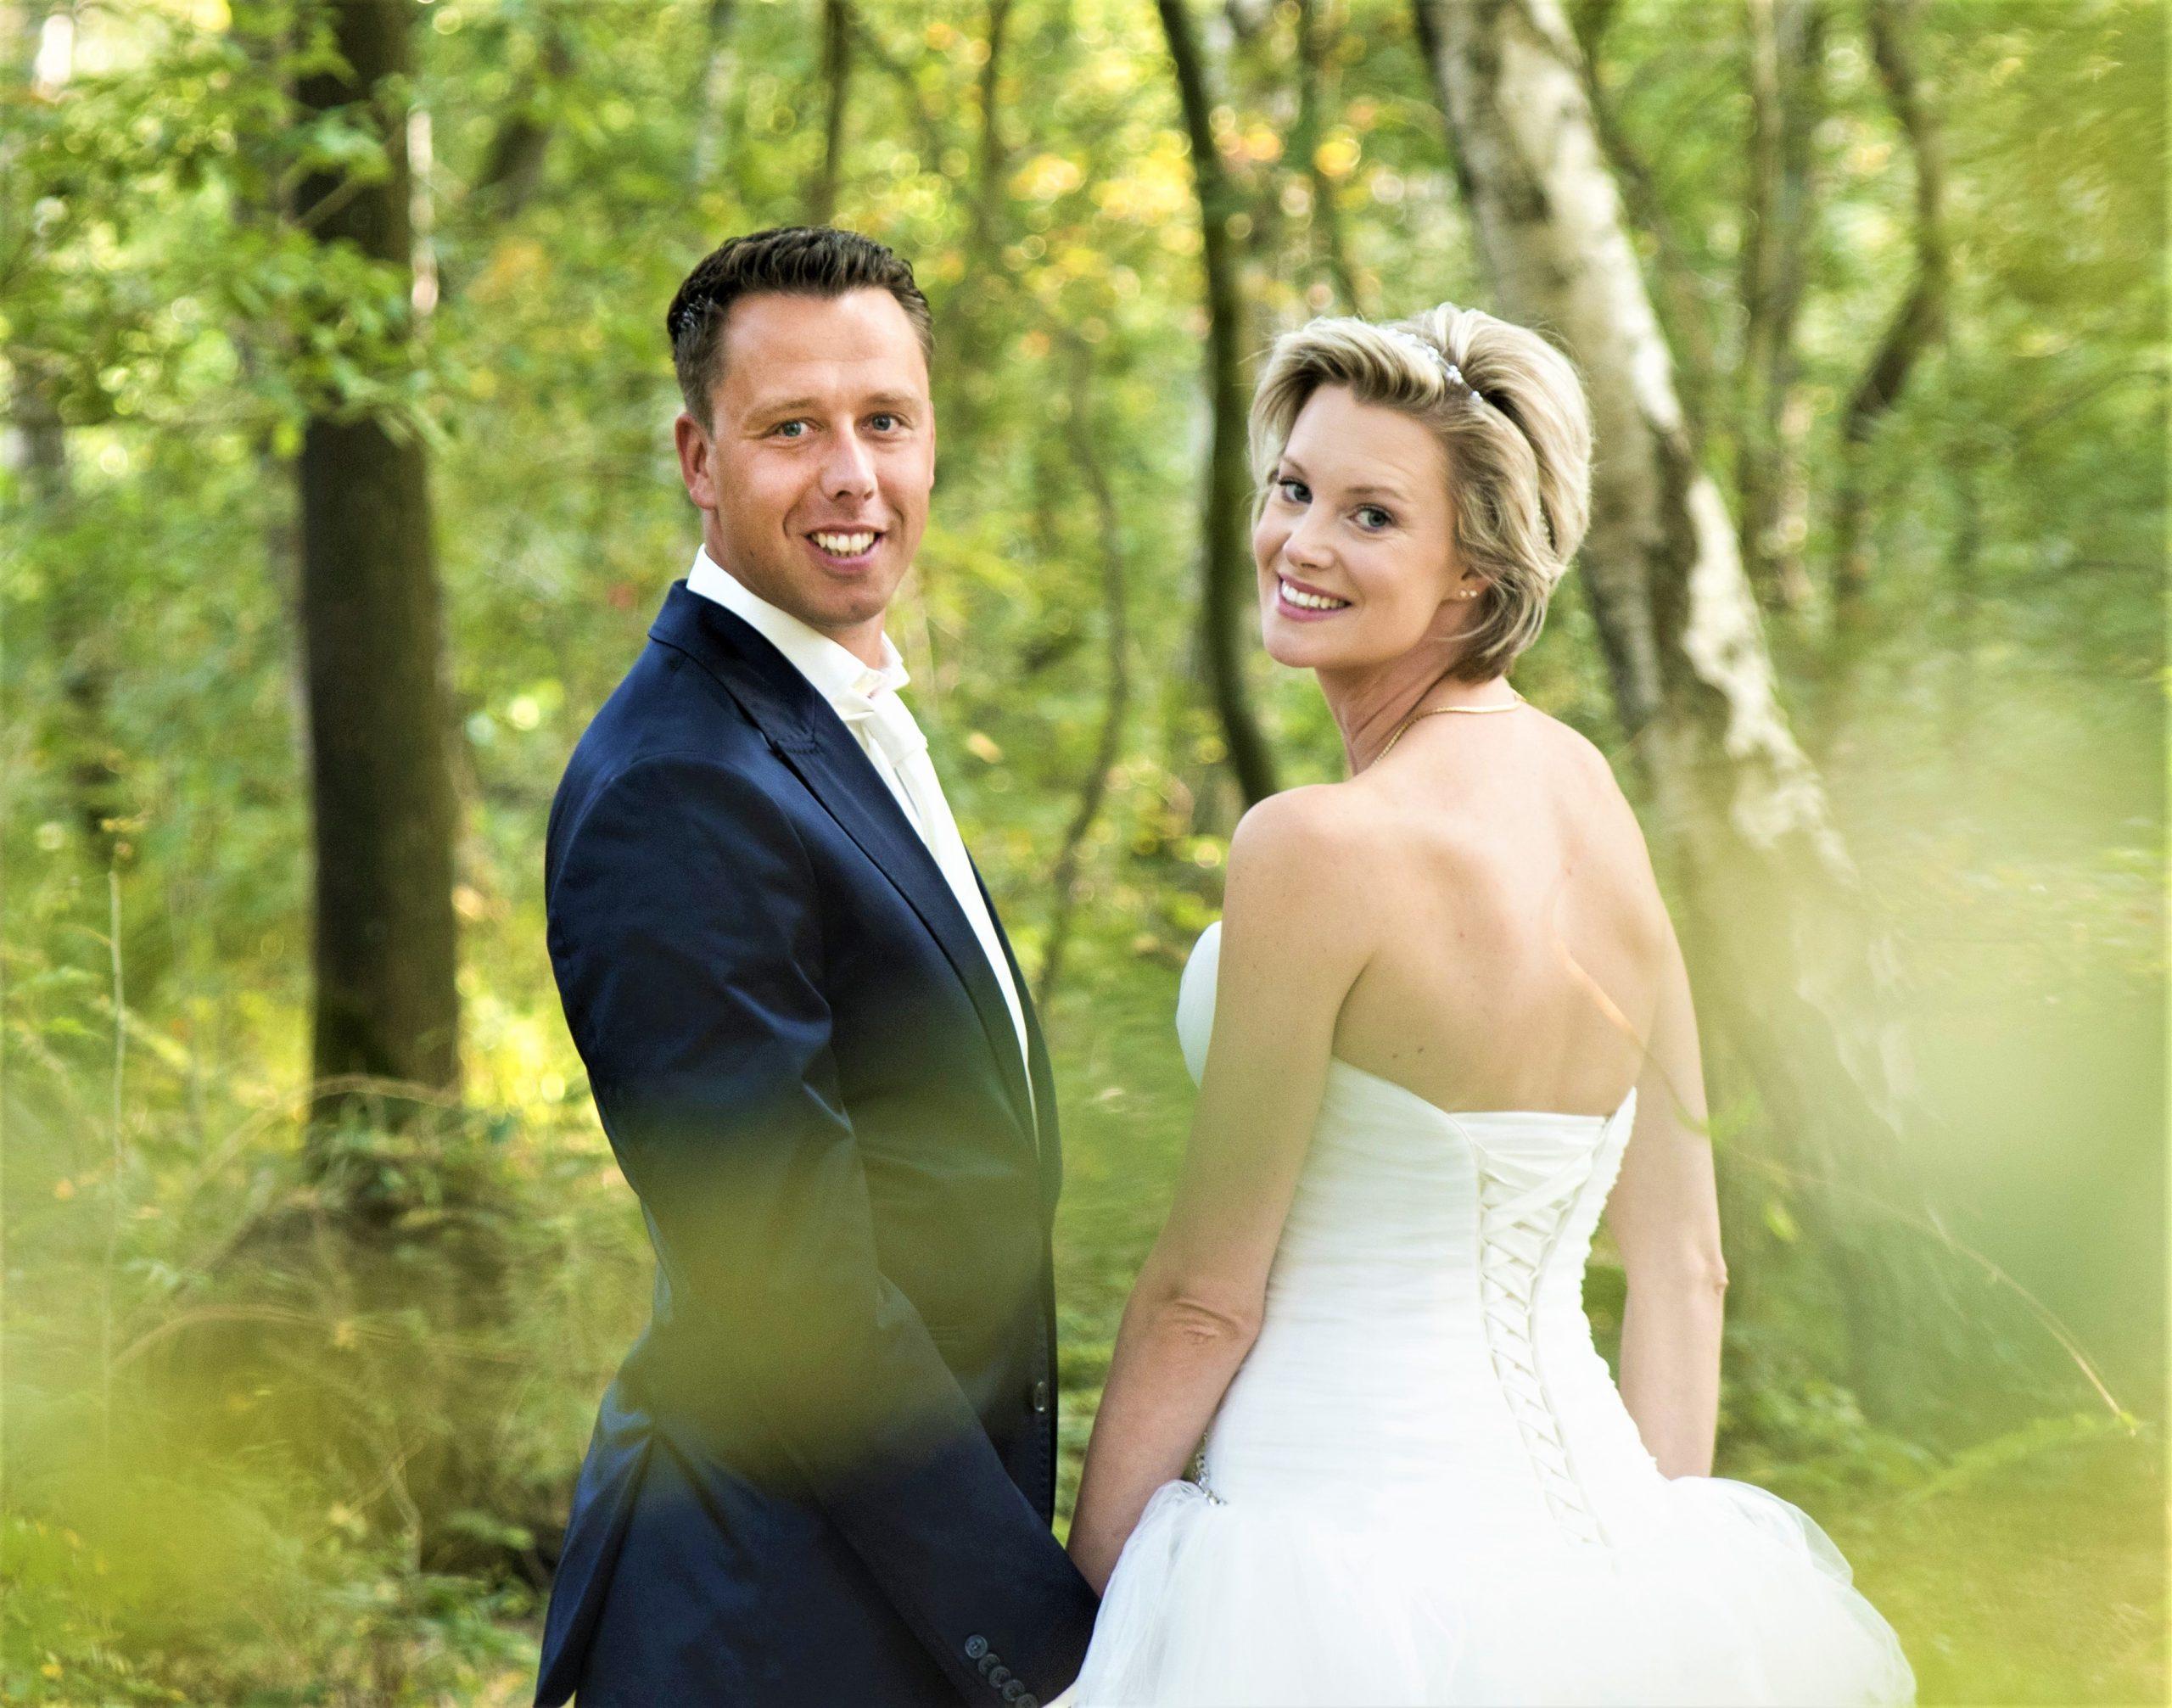 Angela & Jurgen